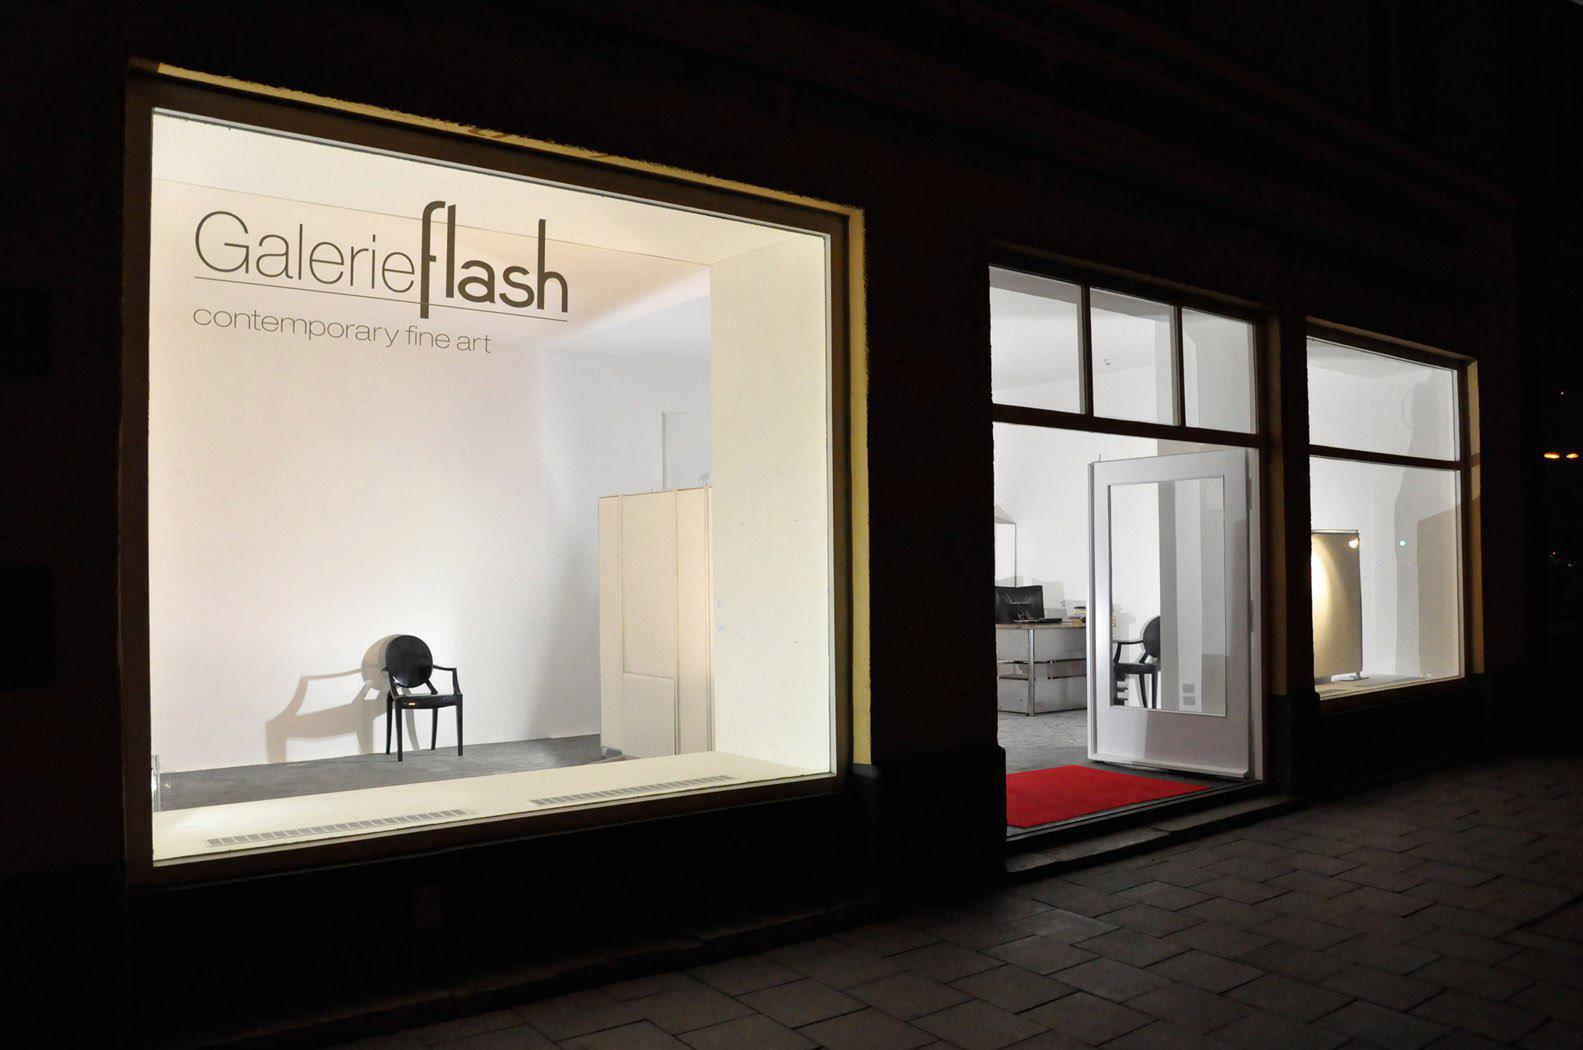 Galerie_flash_Muenchen_Munich